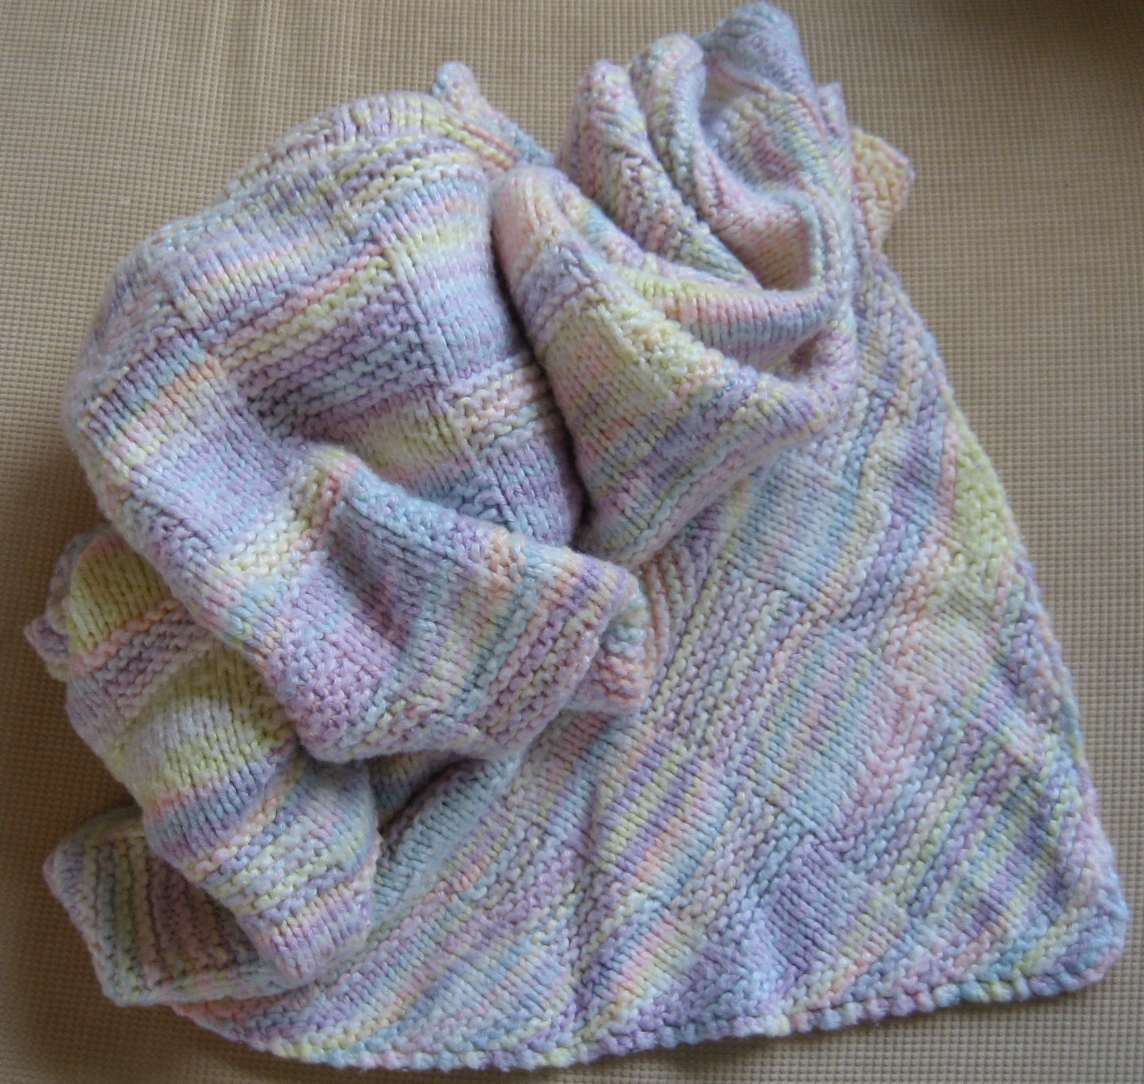 knit baby blanket knitting gallery. Black Bedroom Furniture Sets. Home Design Ideas